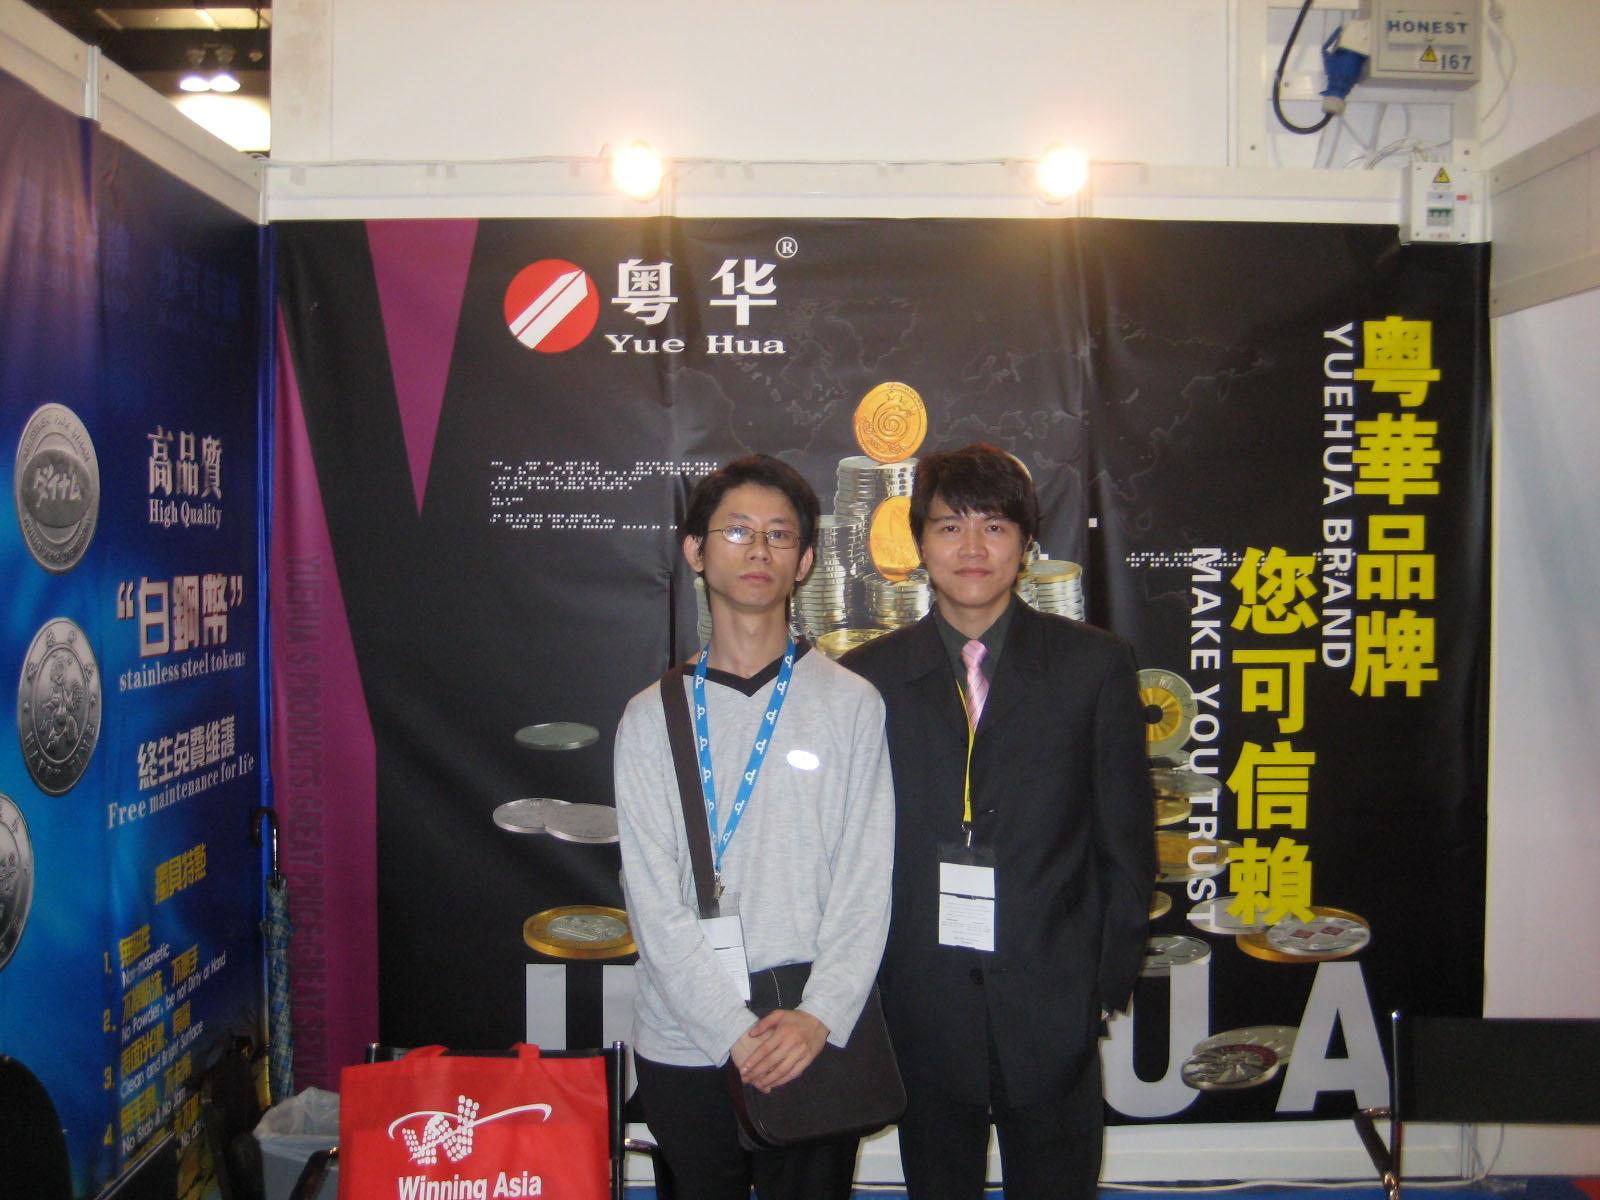 G2E Asia 2008